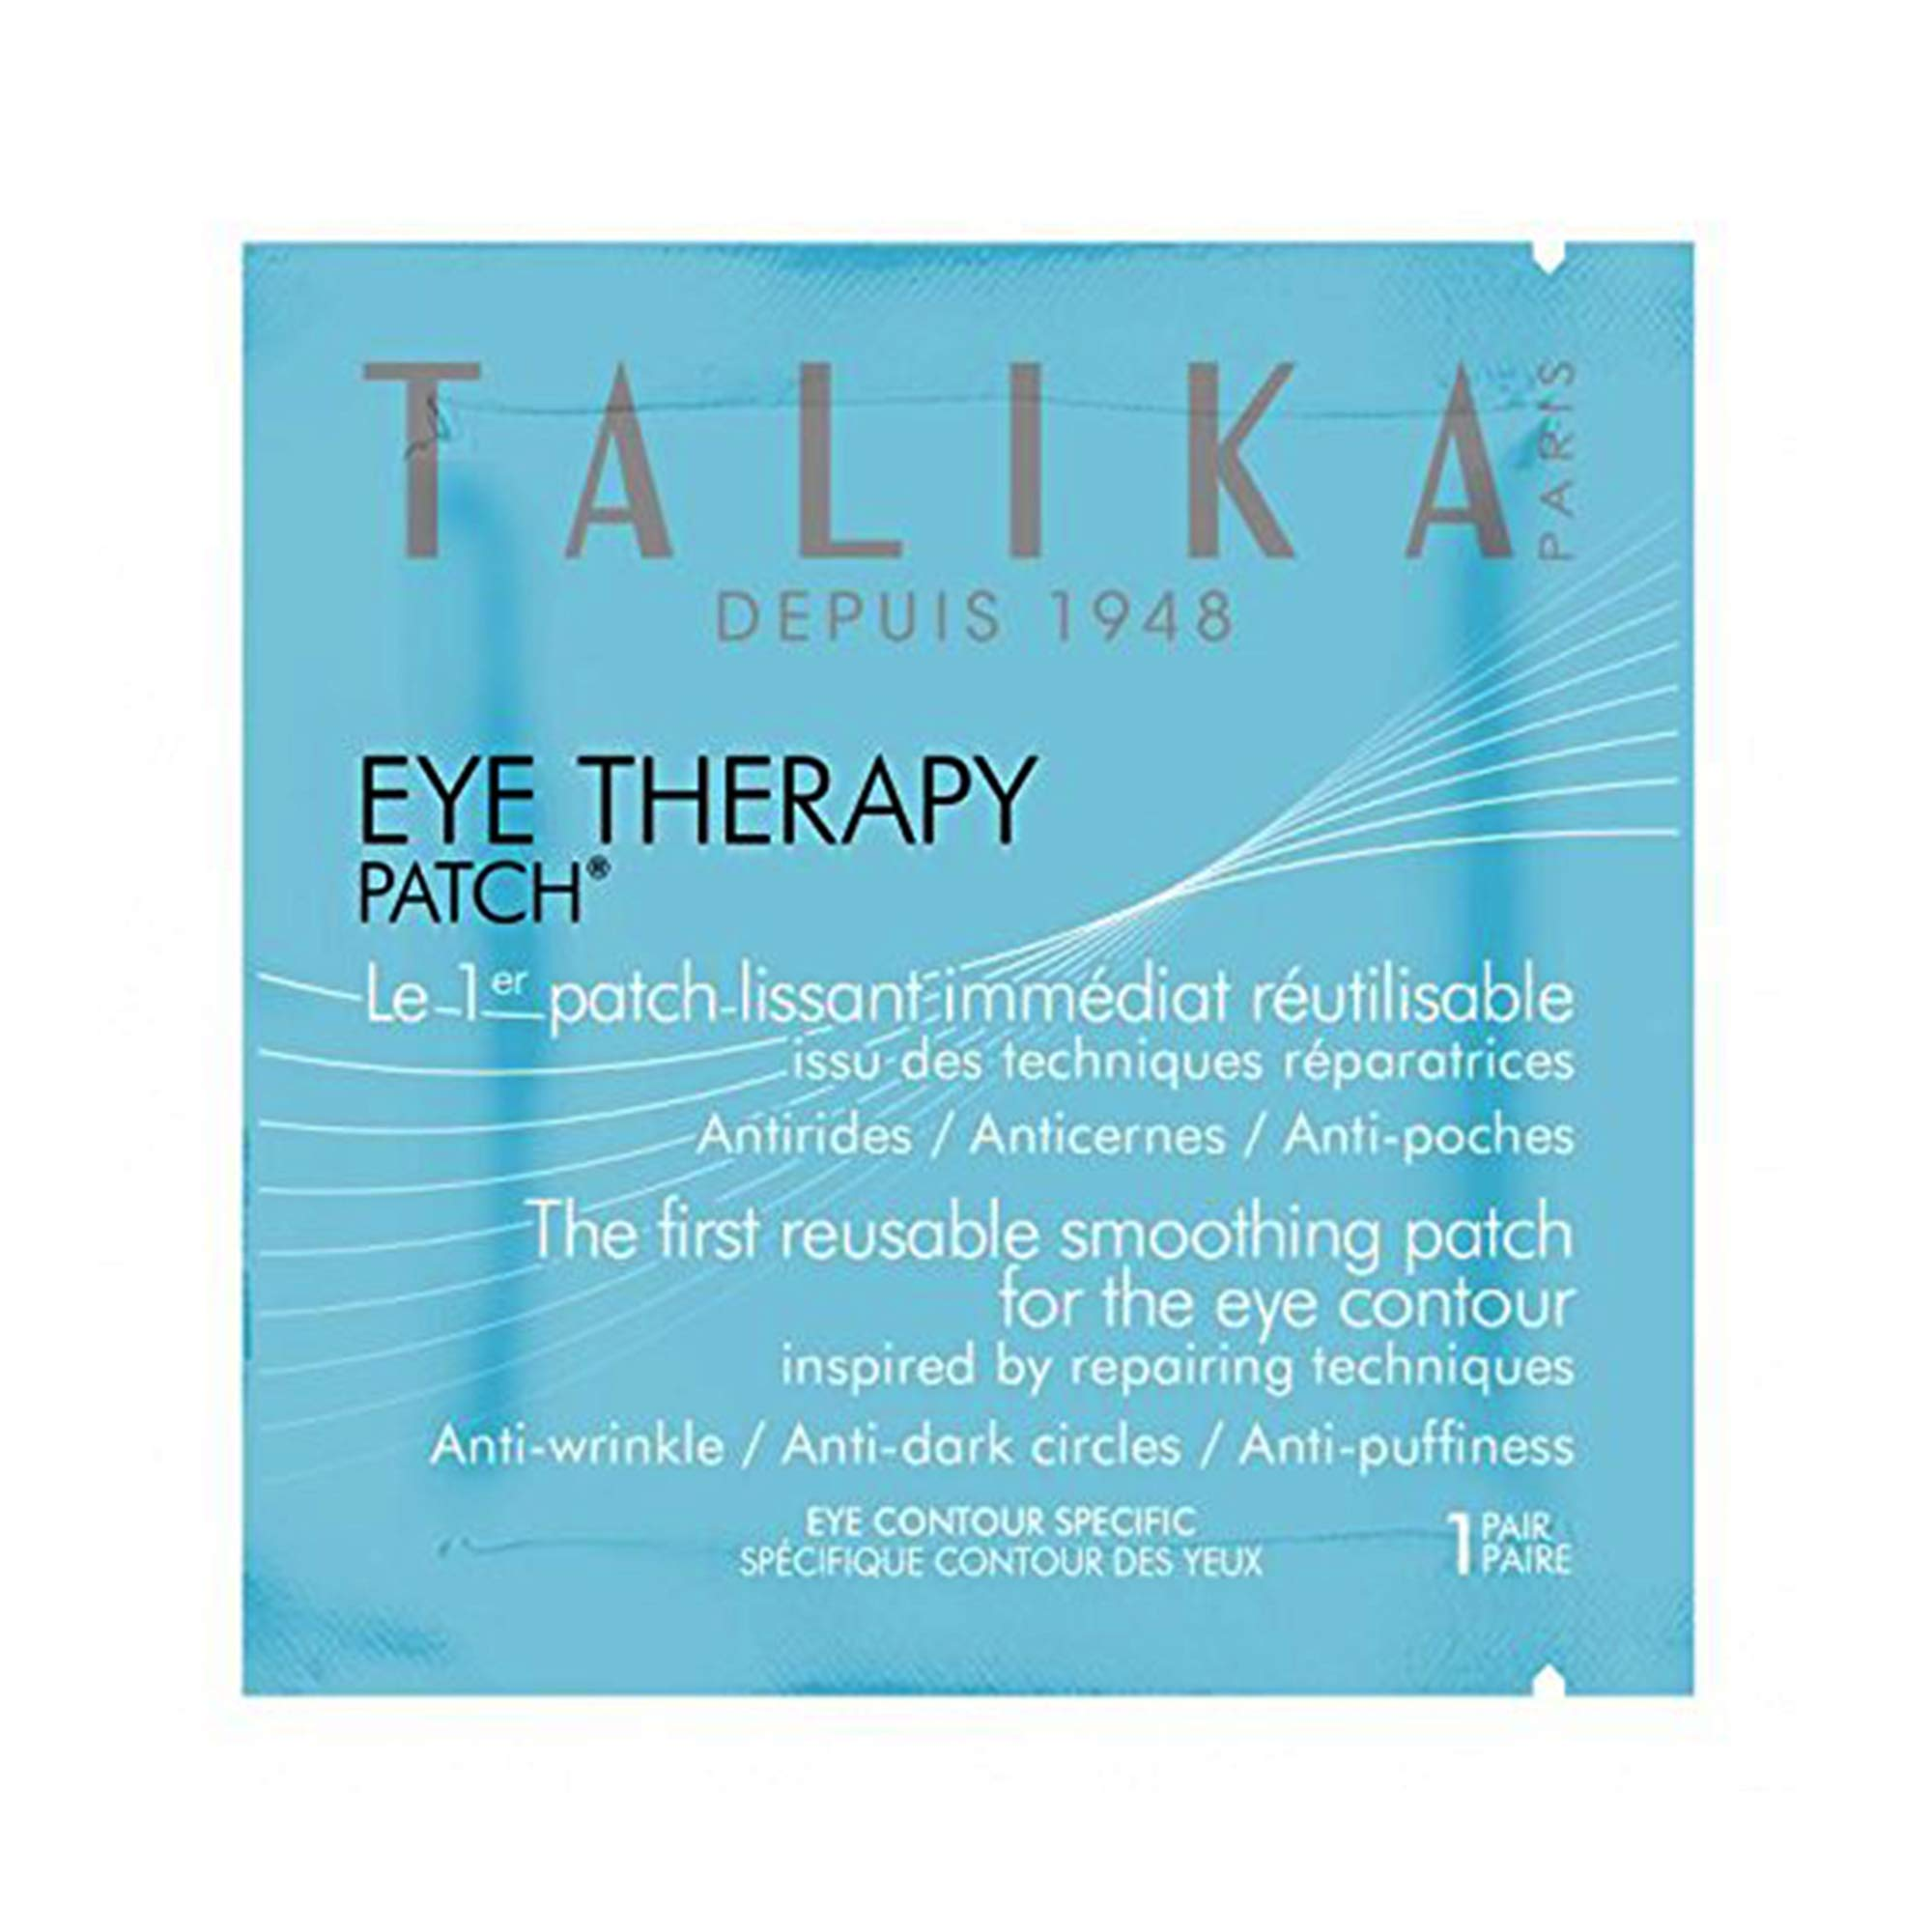 Eye Therapy Patch Mask, 2.99 fl. oz. by Talika (Image #3)